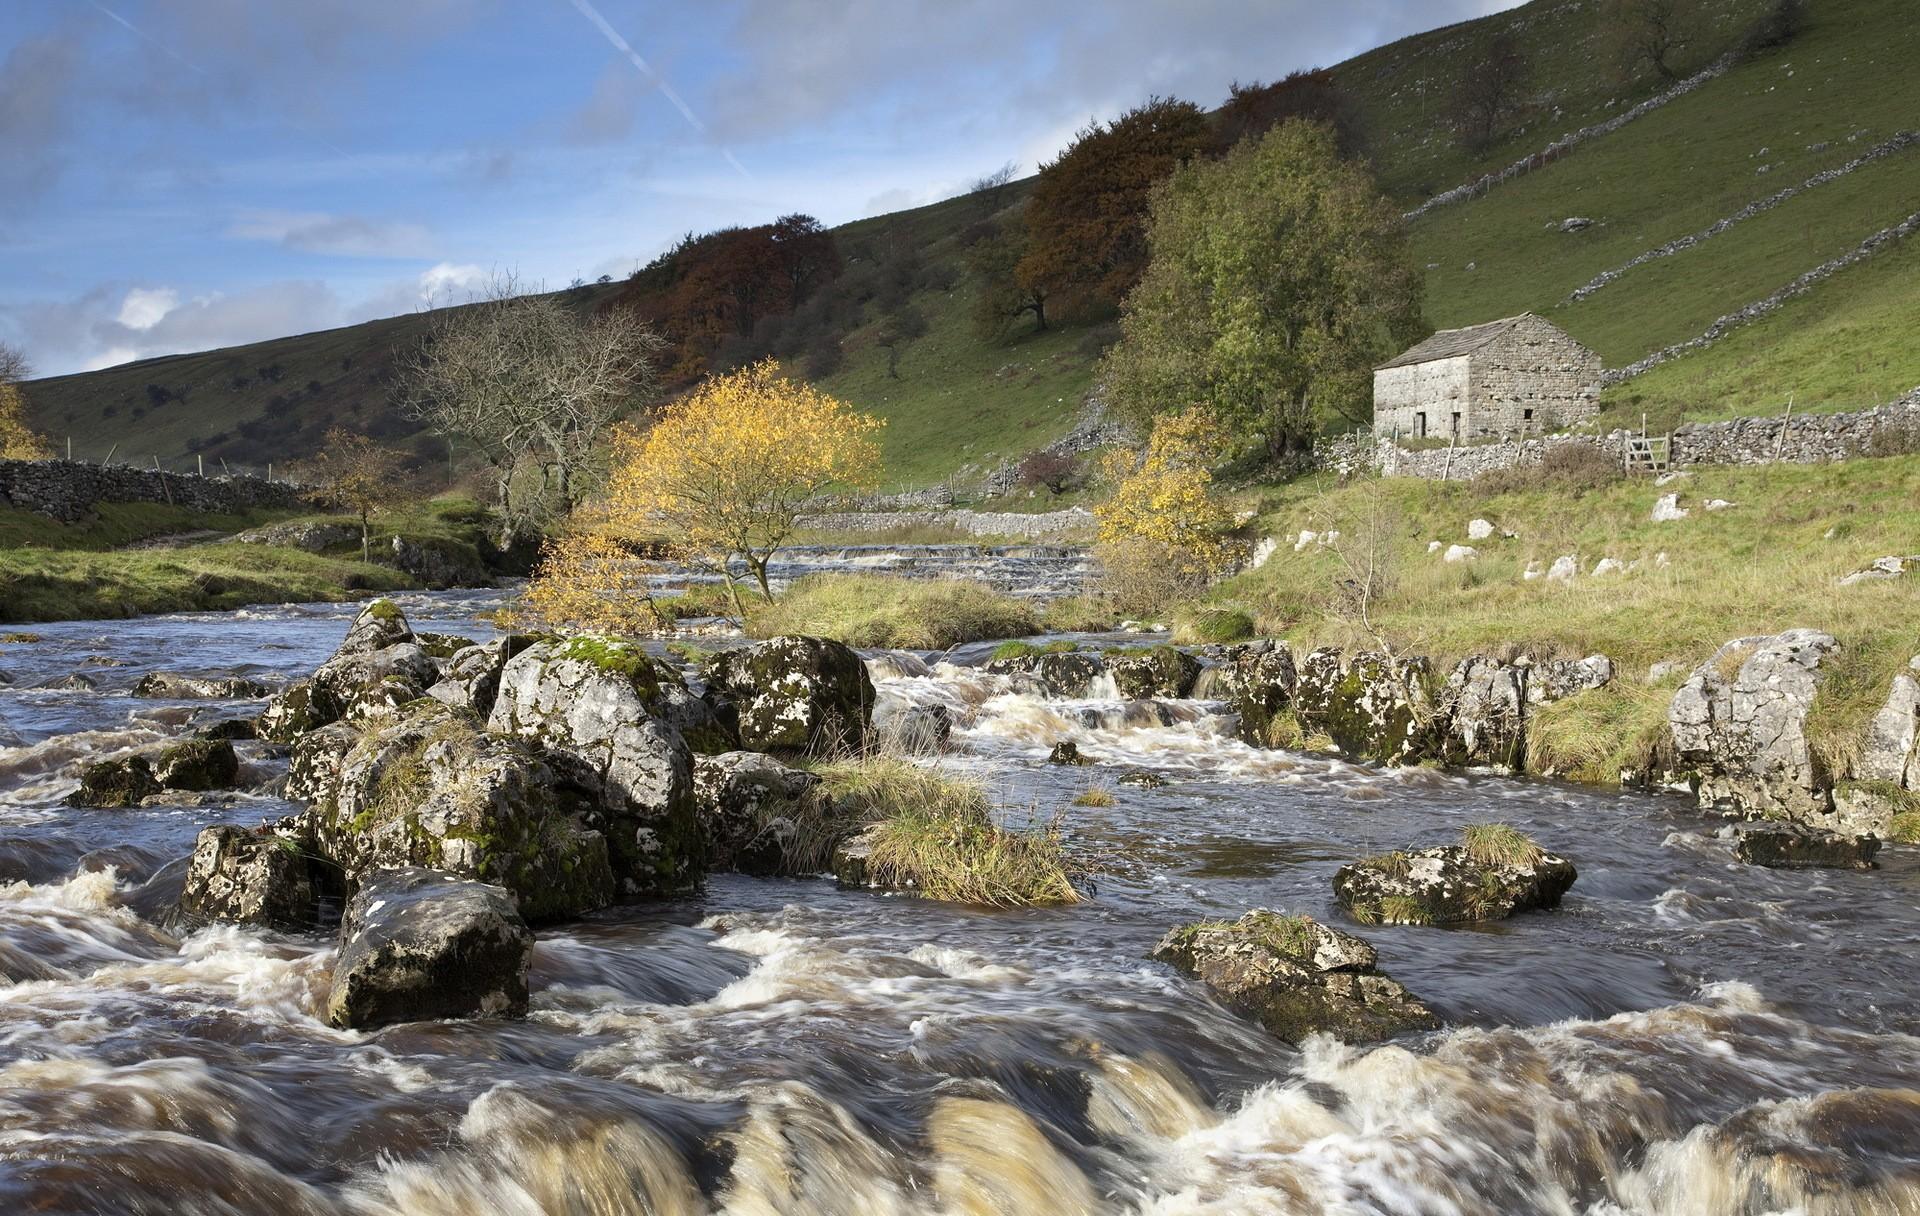 General 1920x1216 landscape nature river stones water